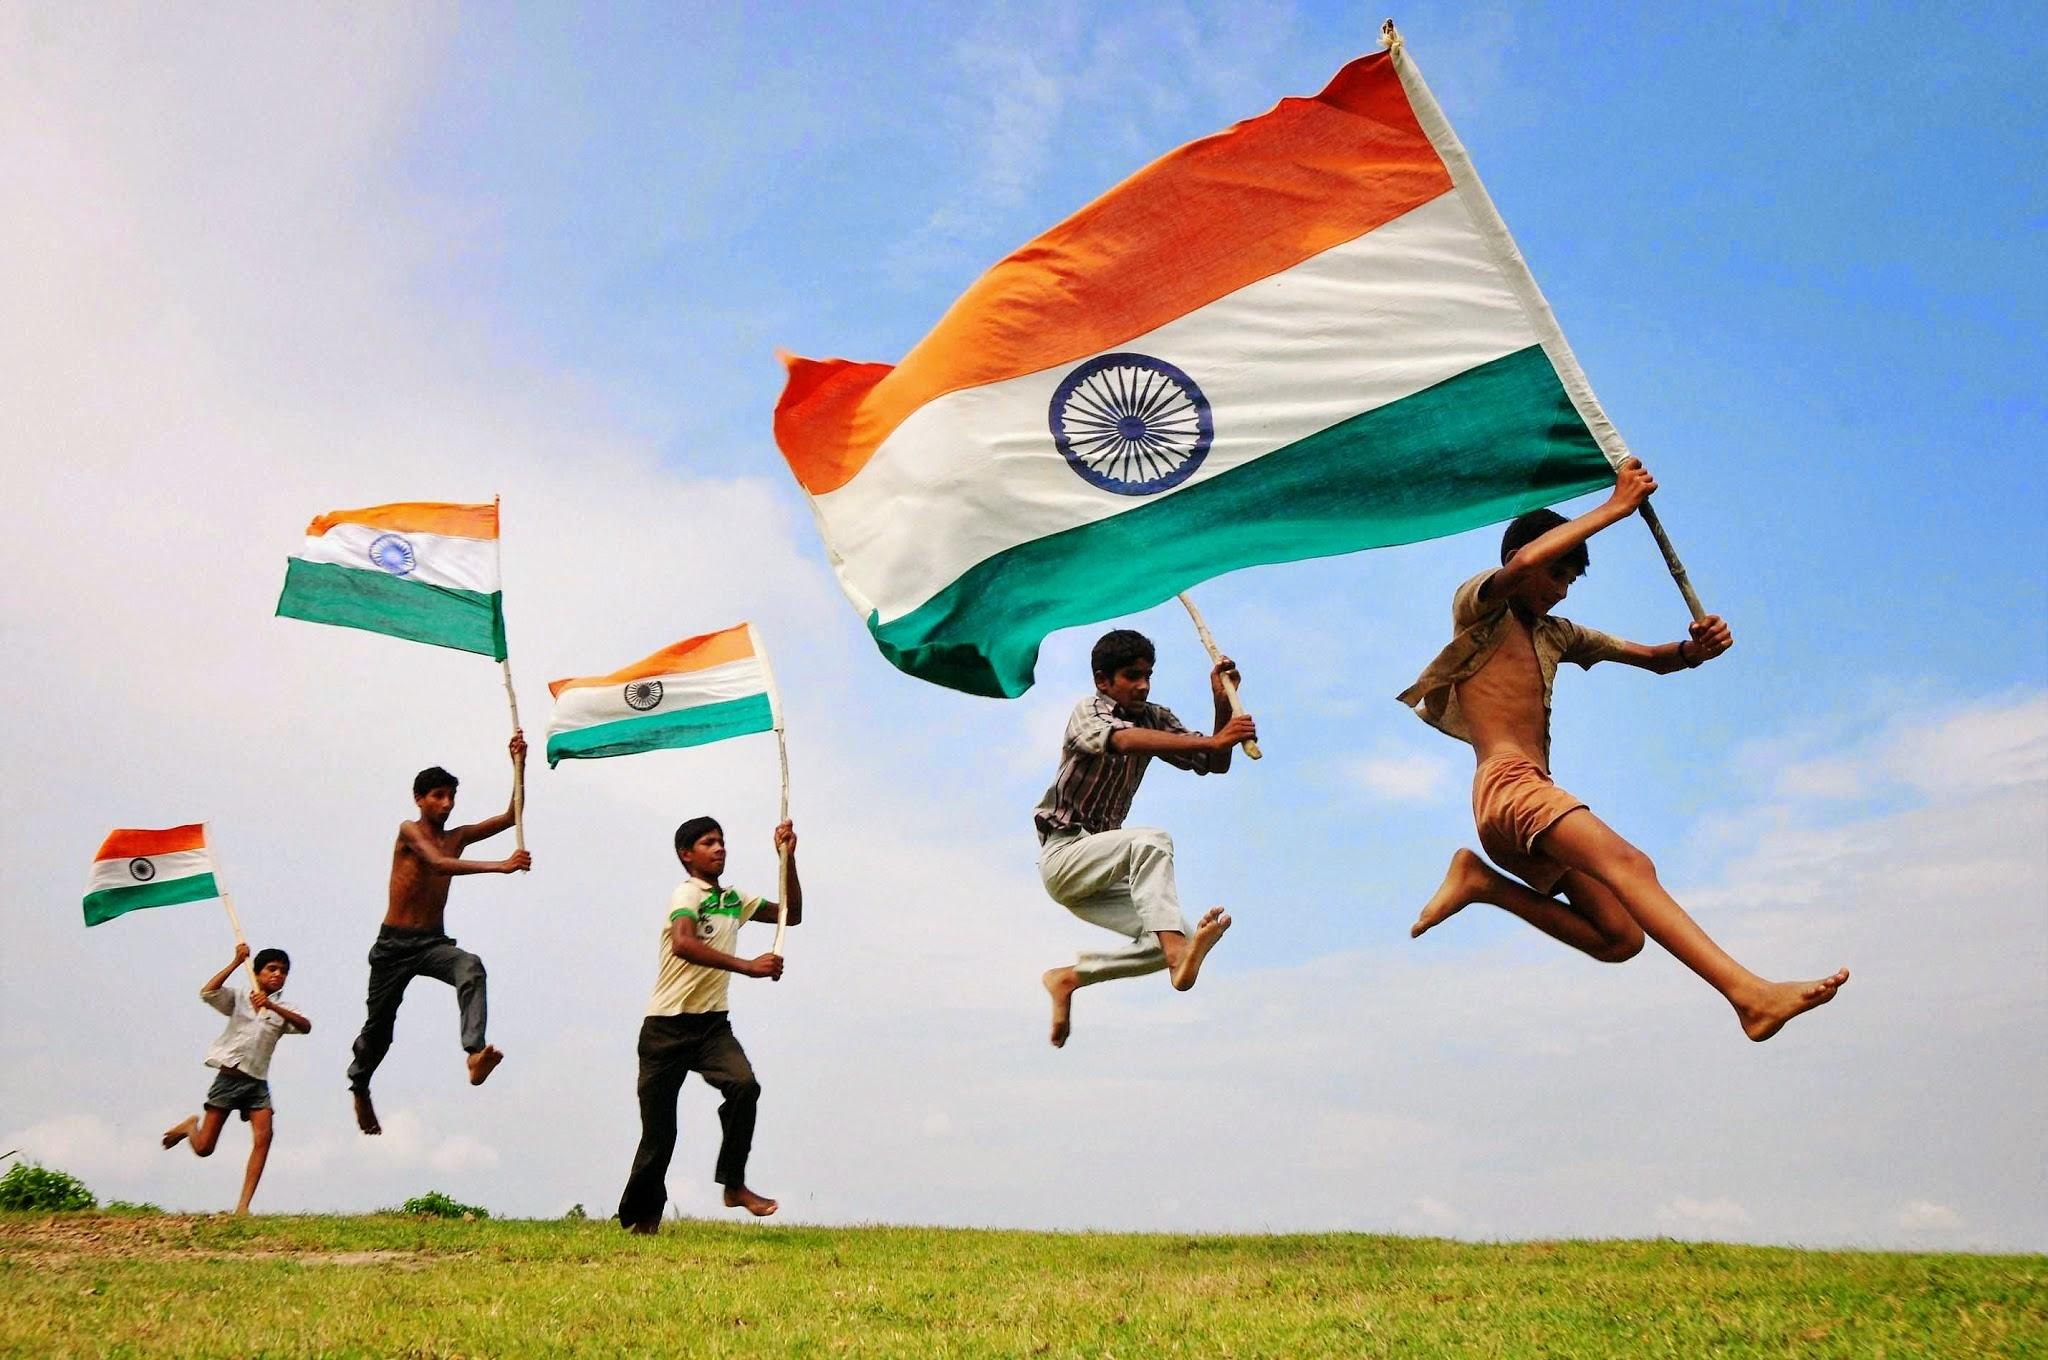 republic-day-of-india-flag